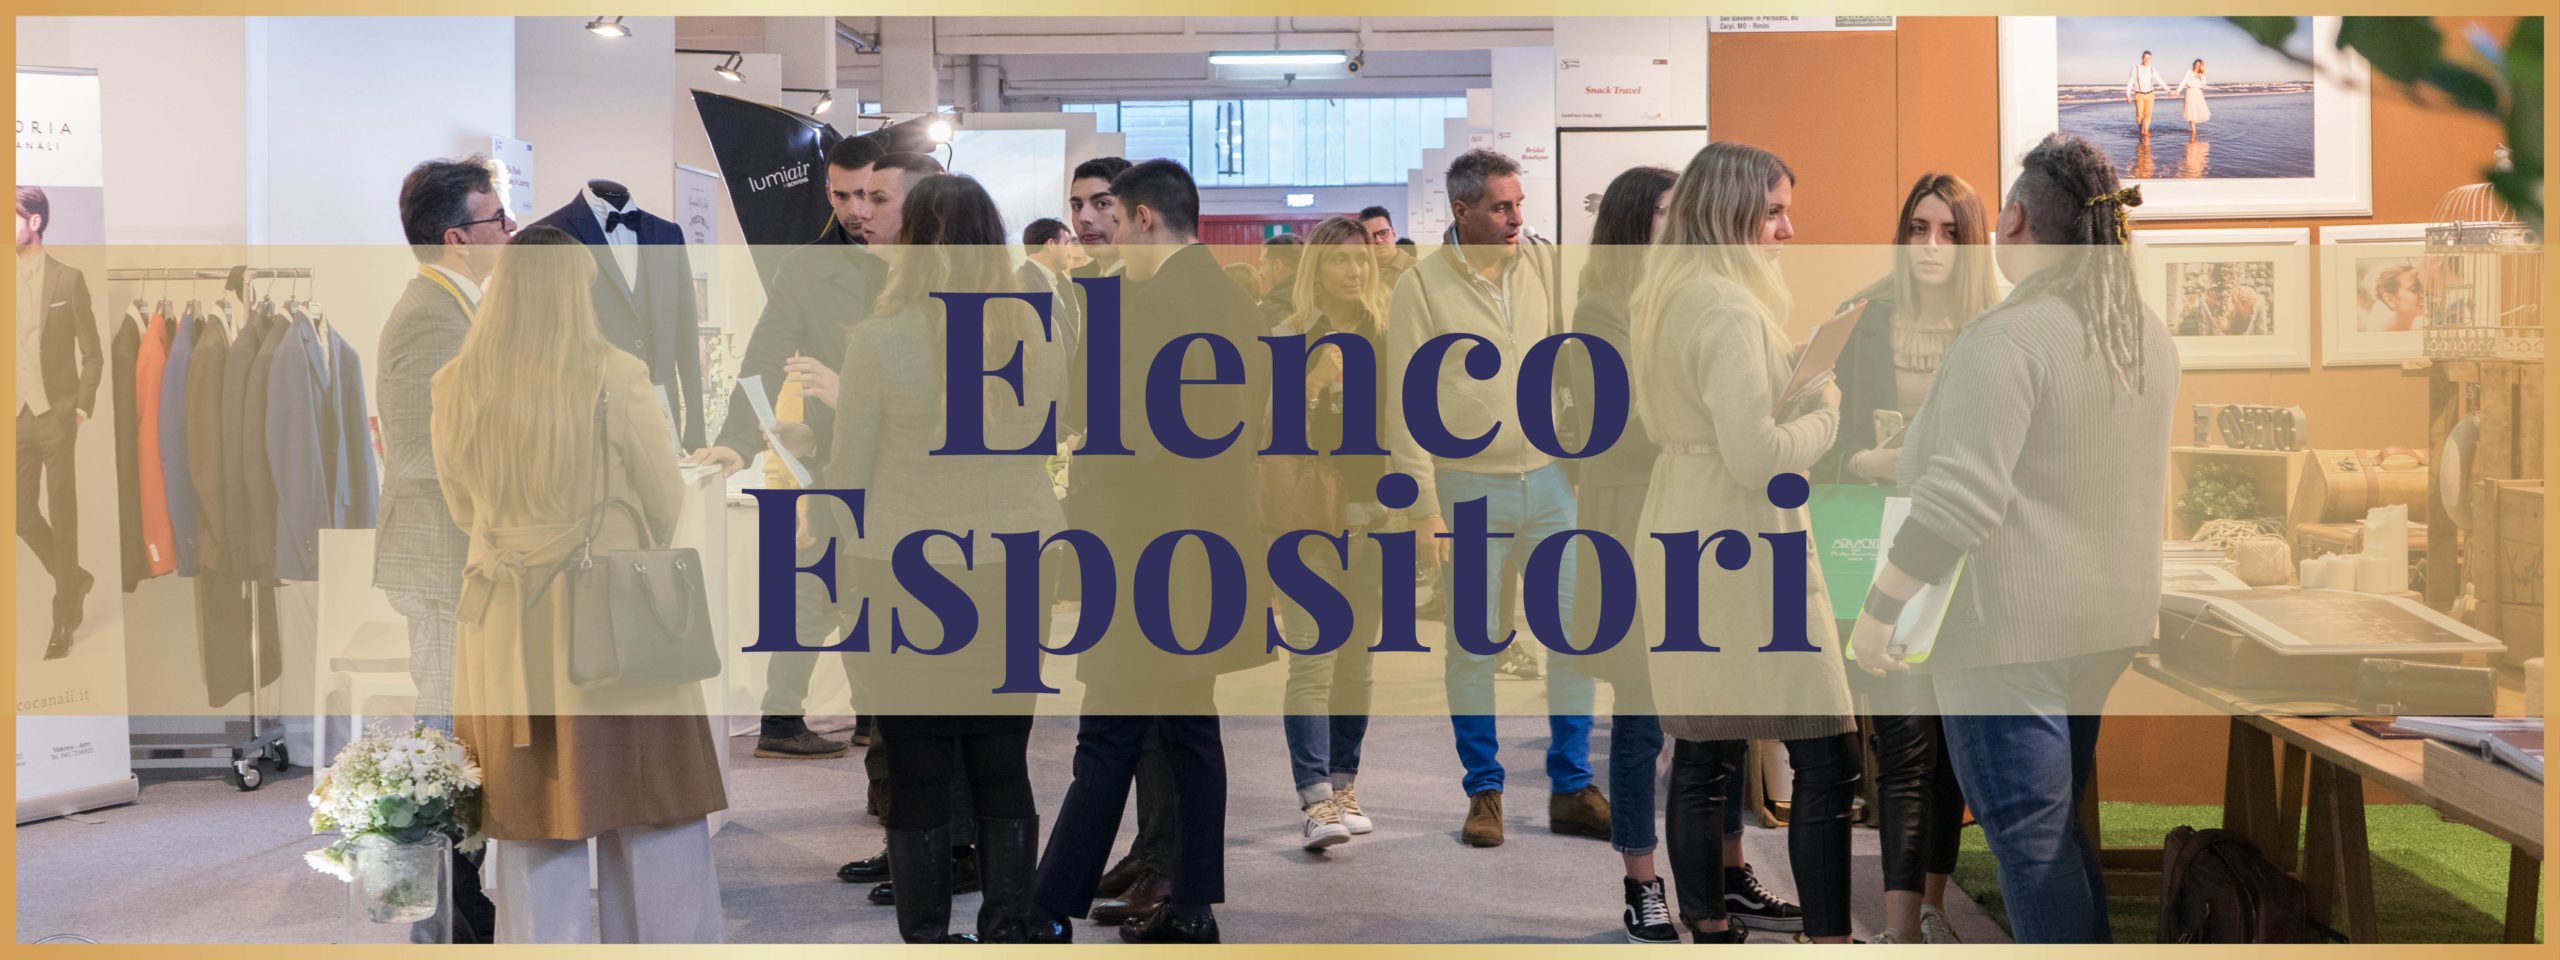 ElencoEspositori_CircuitoSiSposa